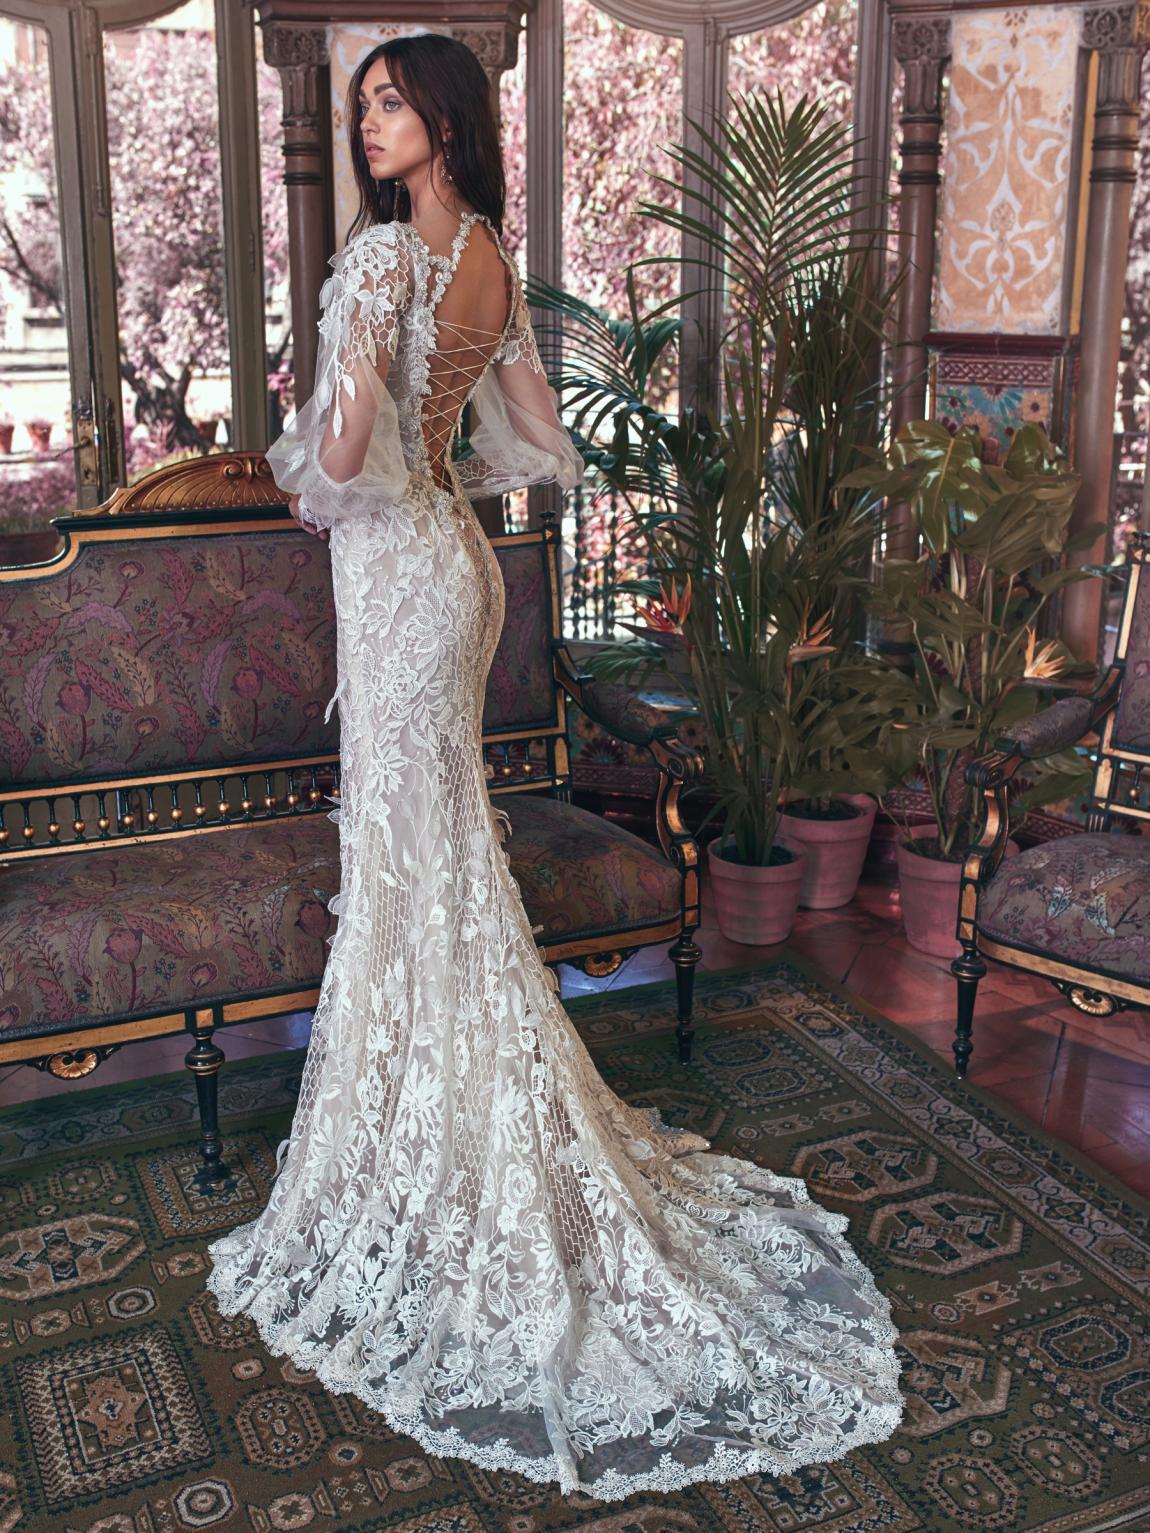 Luxury wedding dresses from Galia Lahav